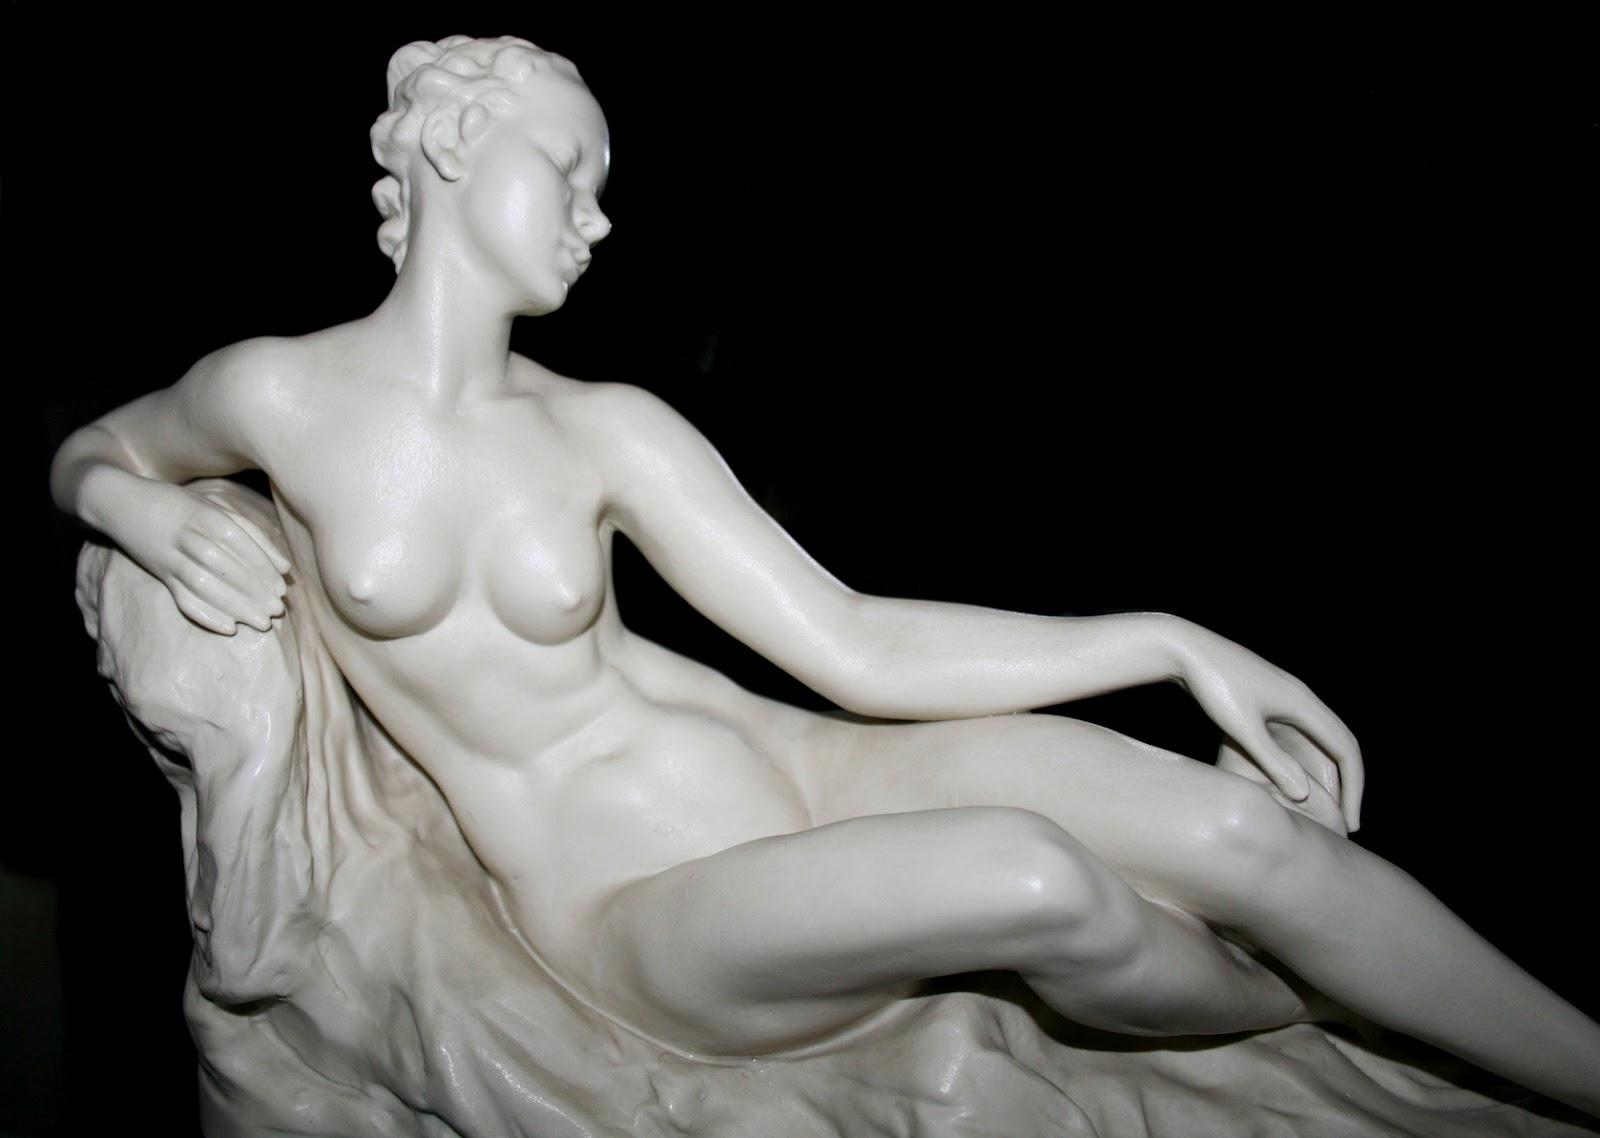 Скульптура голой девушки фото 2 фотография